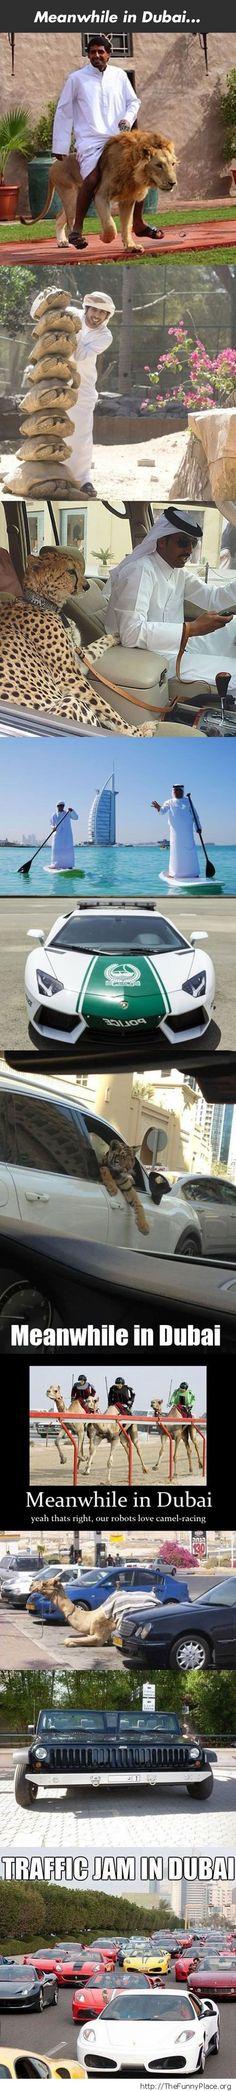 Cool meanwhile in Dubai